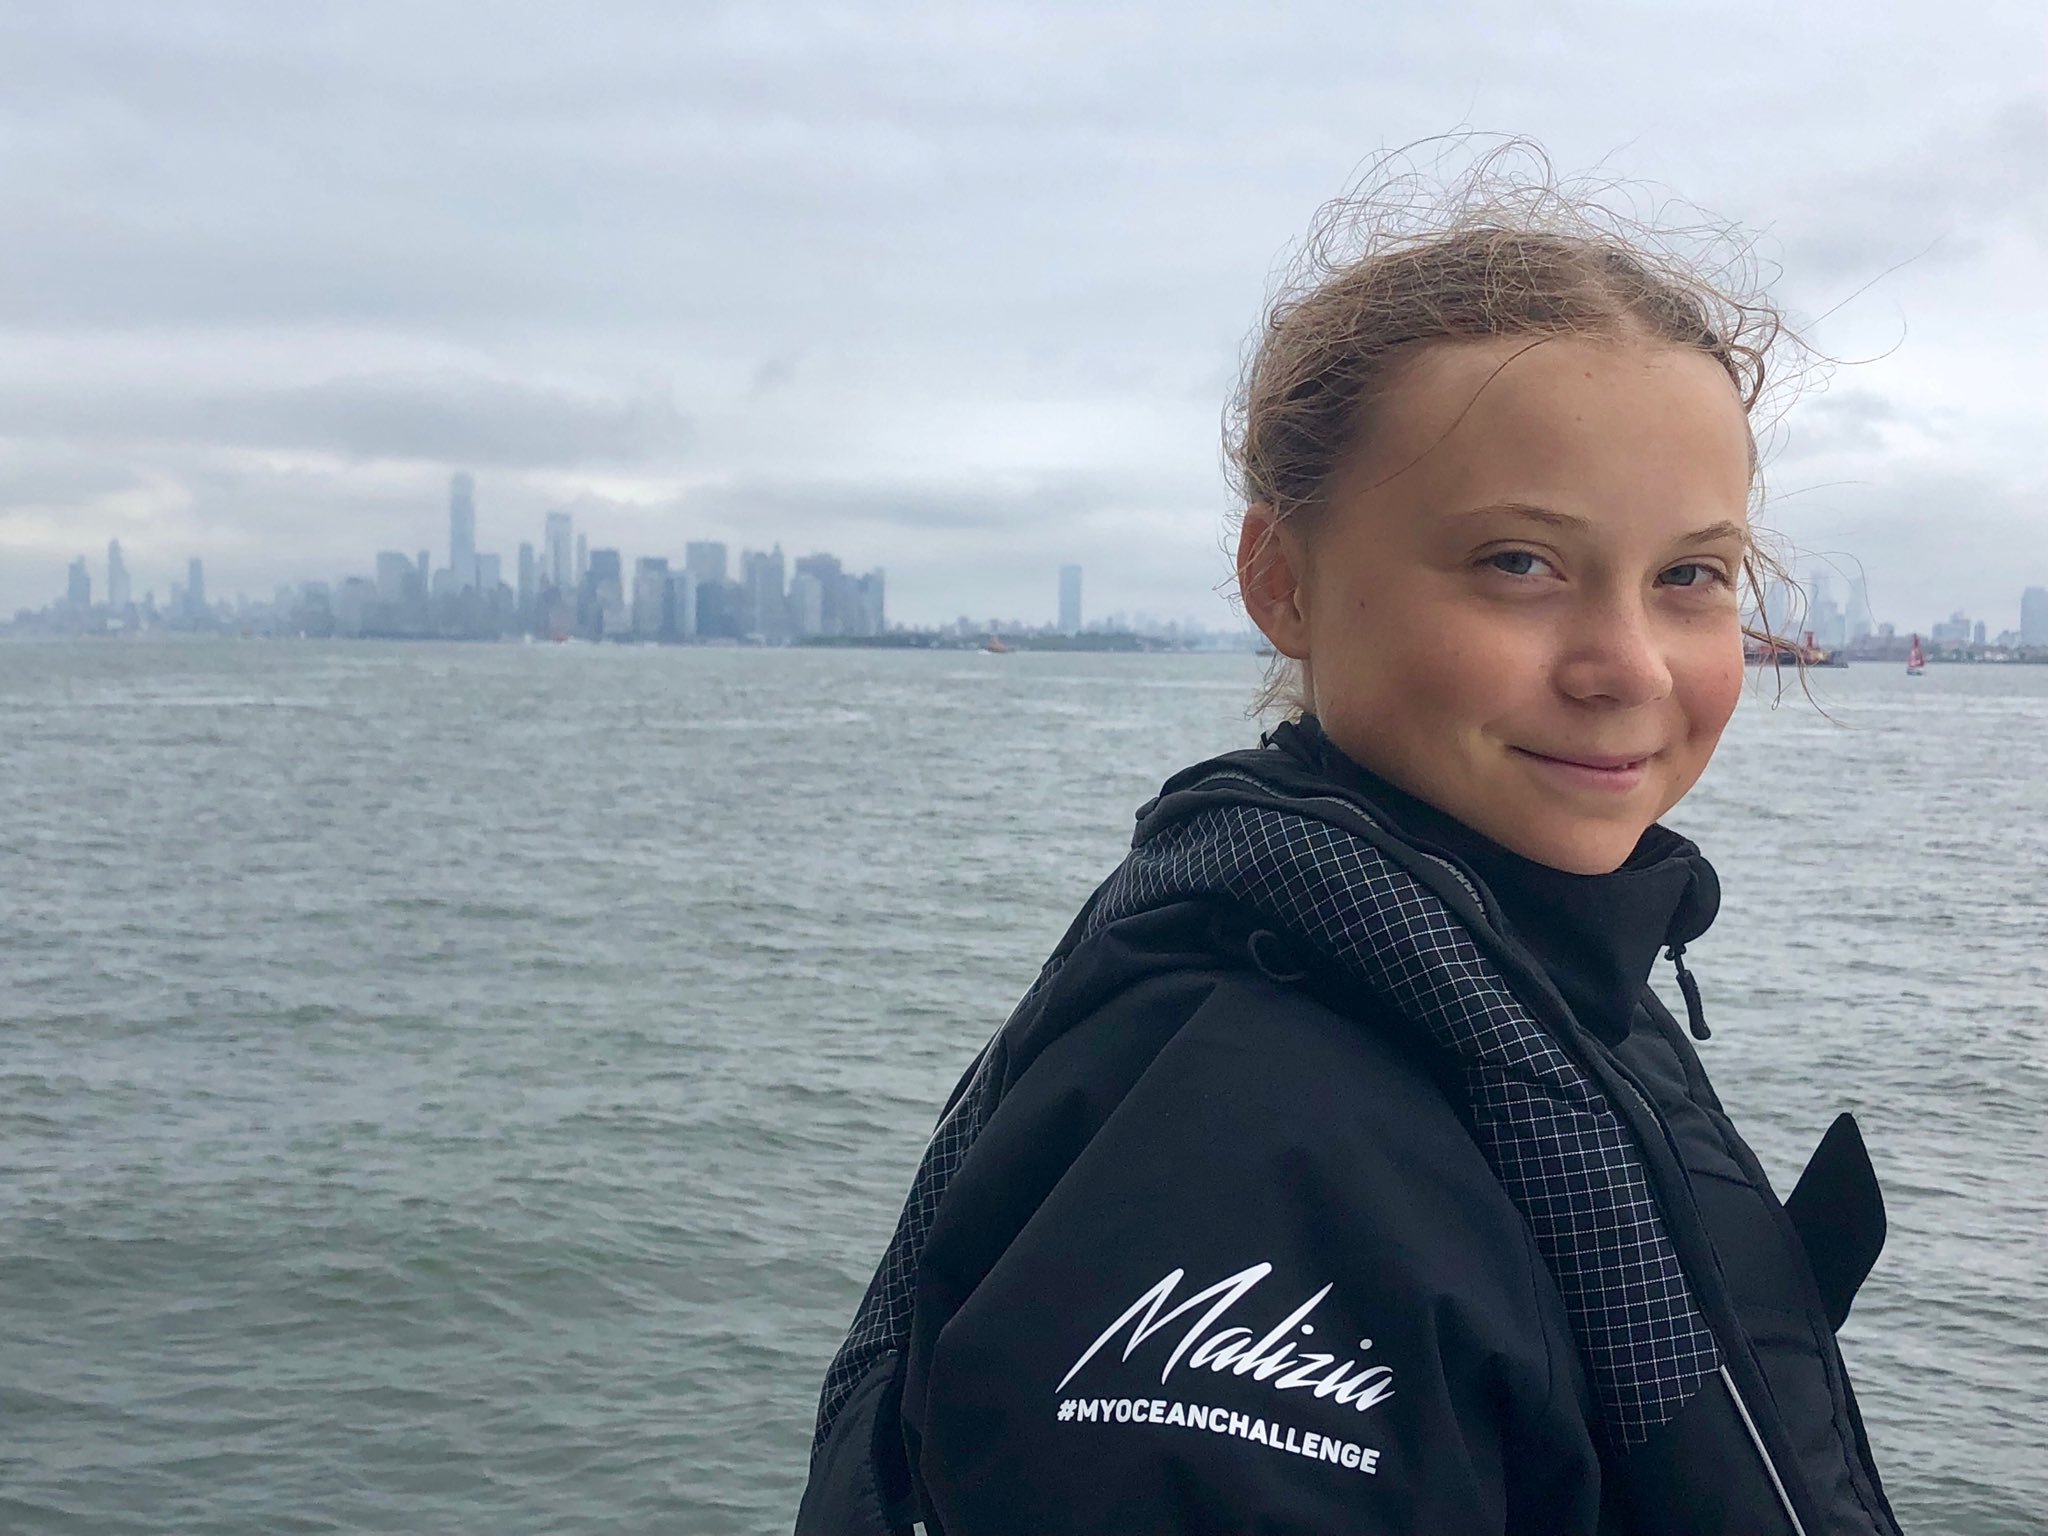 Greta a bordo del 'Malizia II' arribando a Manhattan. Foto: Twitter de Greta Thunberg.